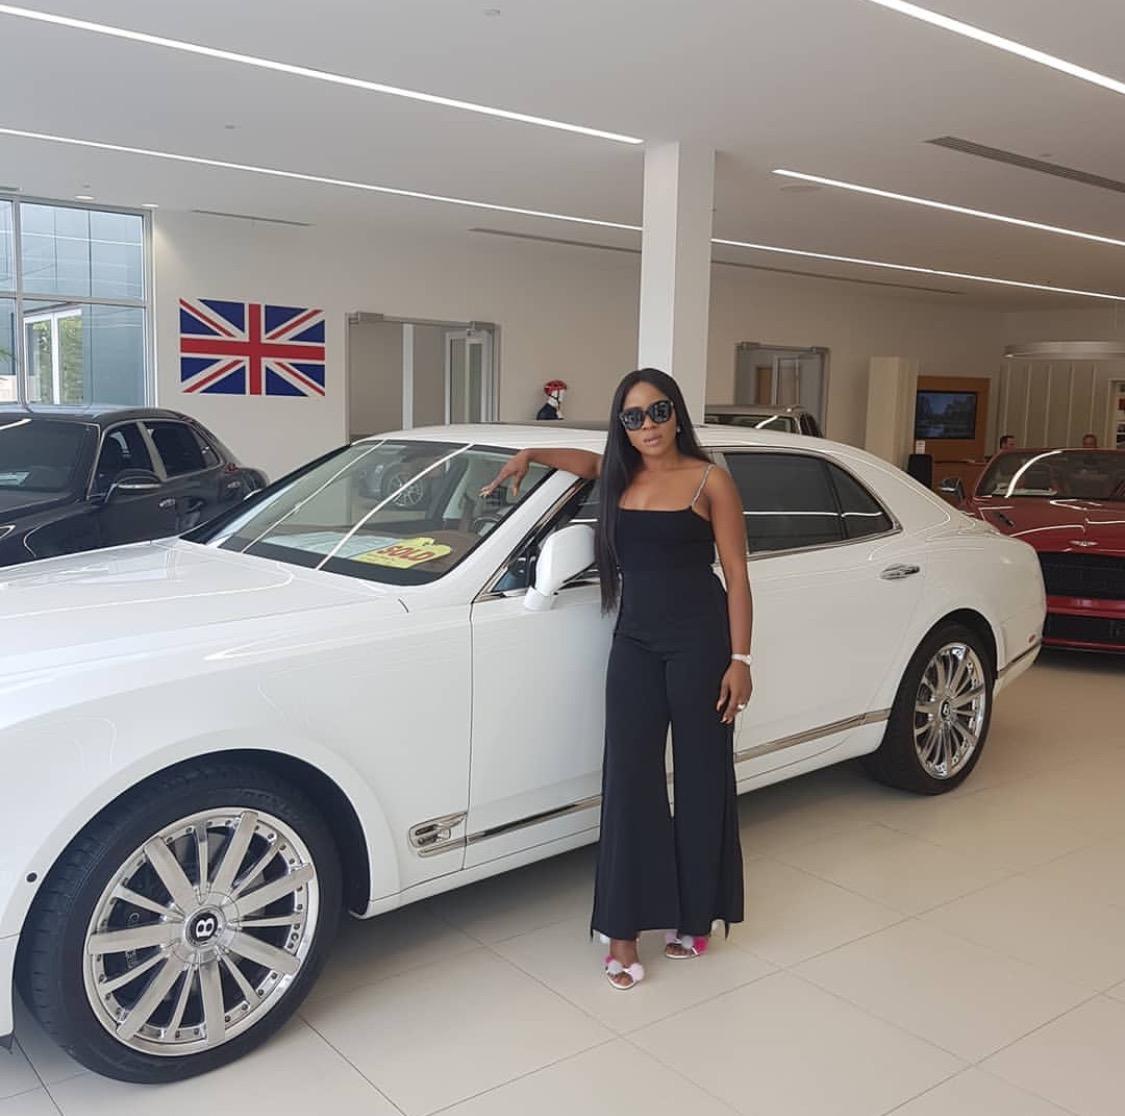 Linda Ikeji Media entrepreneur buys Bentley Mulsanne worth $305,000 for son